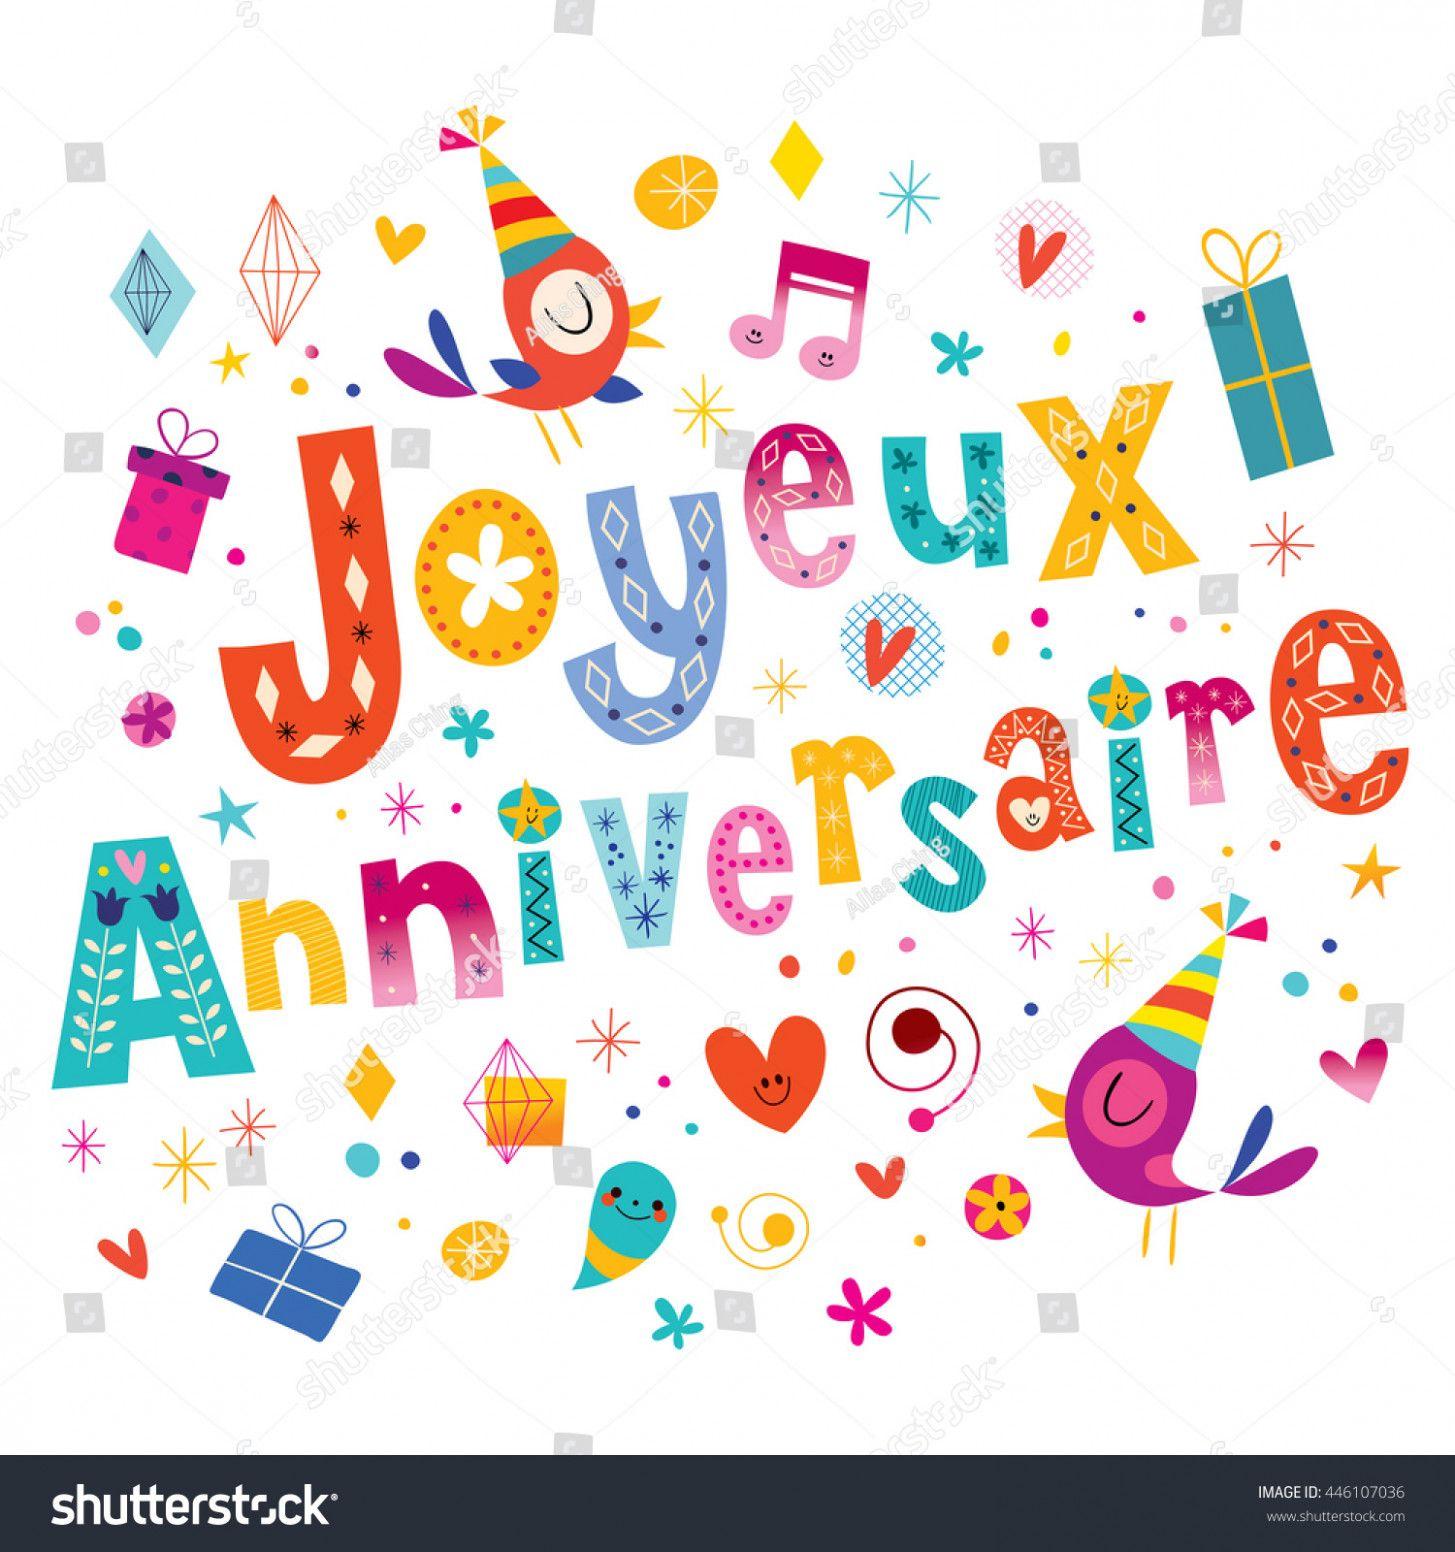 12 Creative Happy Birthday In French Card di 2020 (Dengan